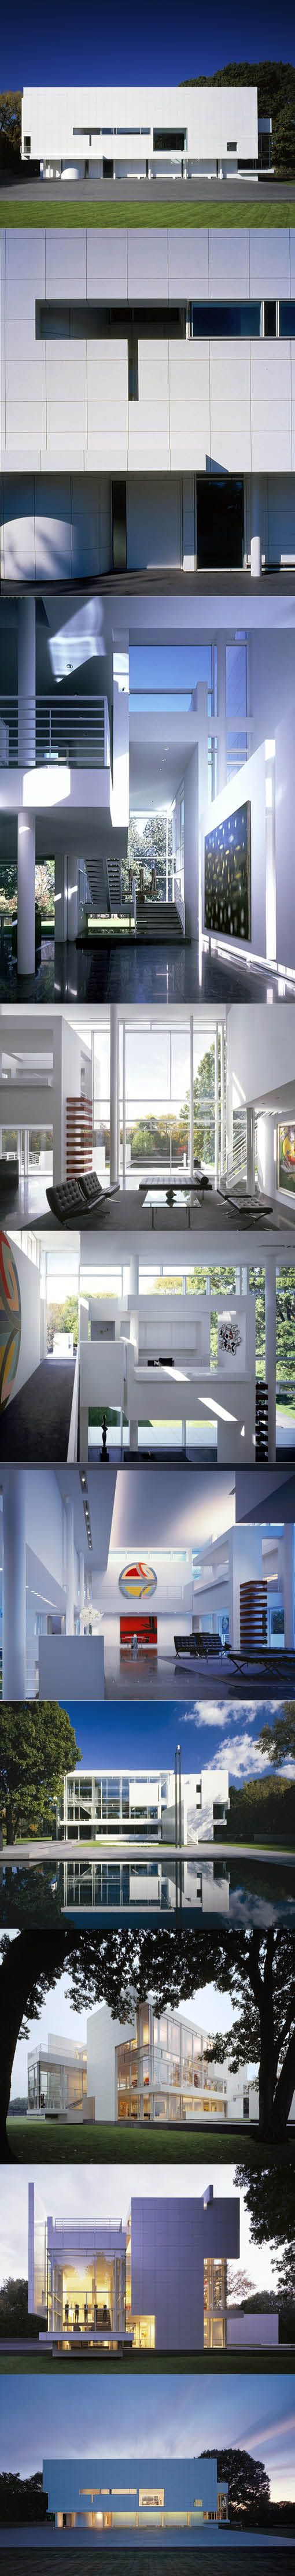 1991-1996 Richard Meier - Rachofsky House / Dallas Texas USA / aluminium / white